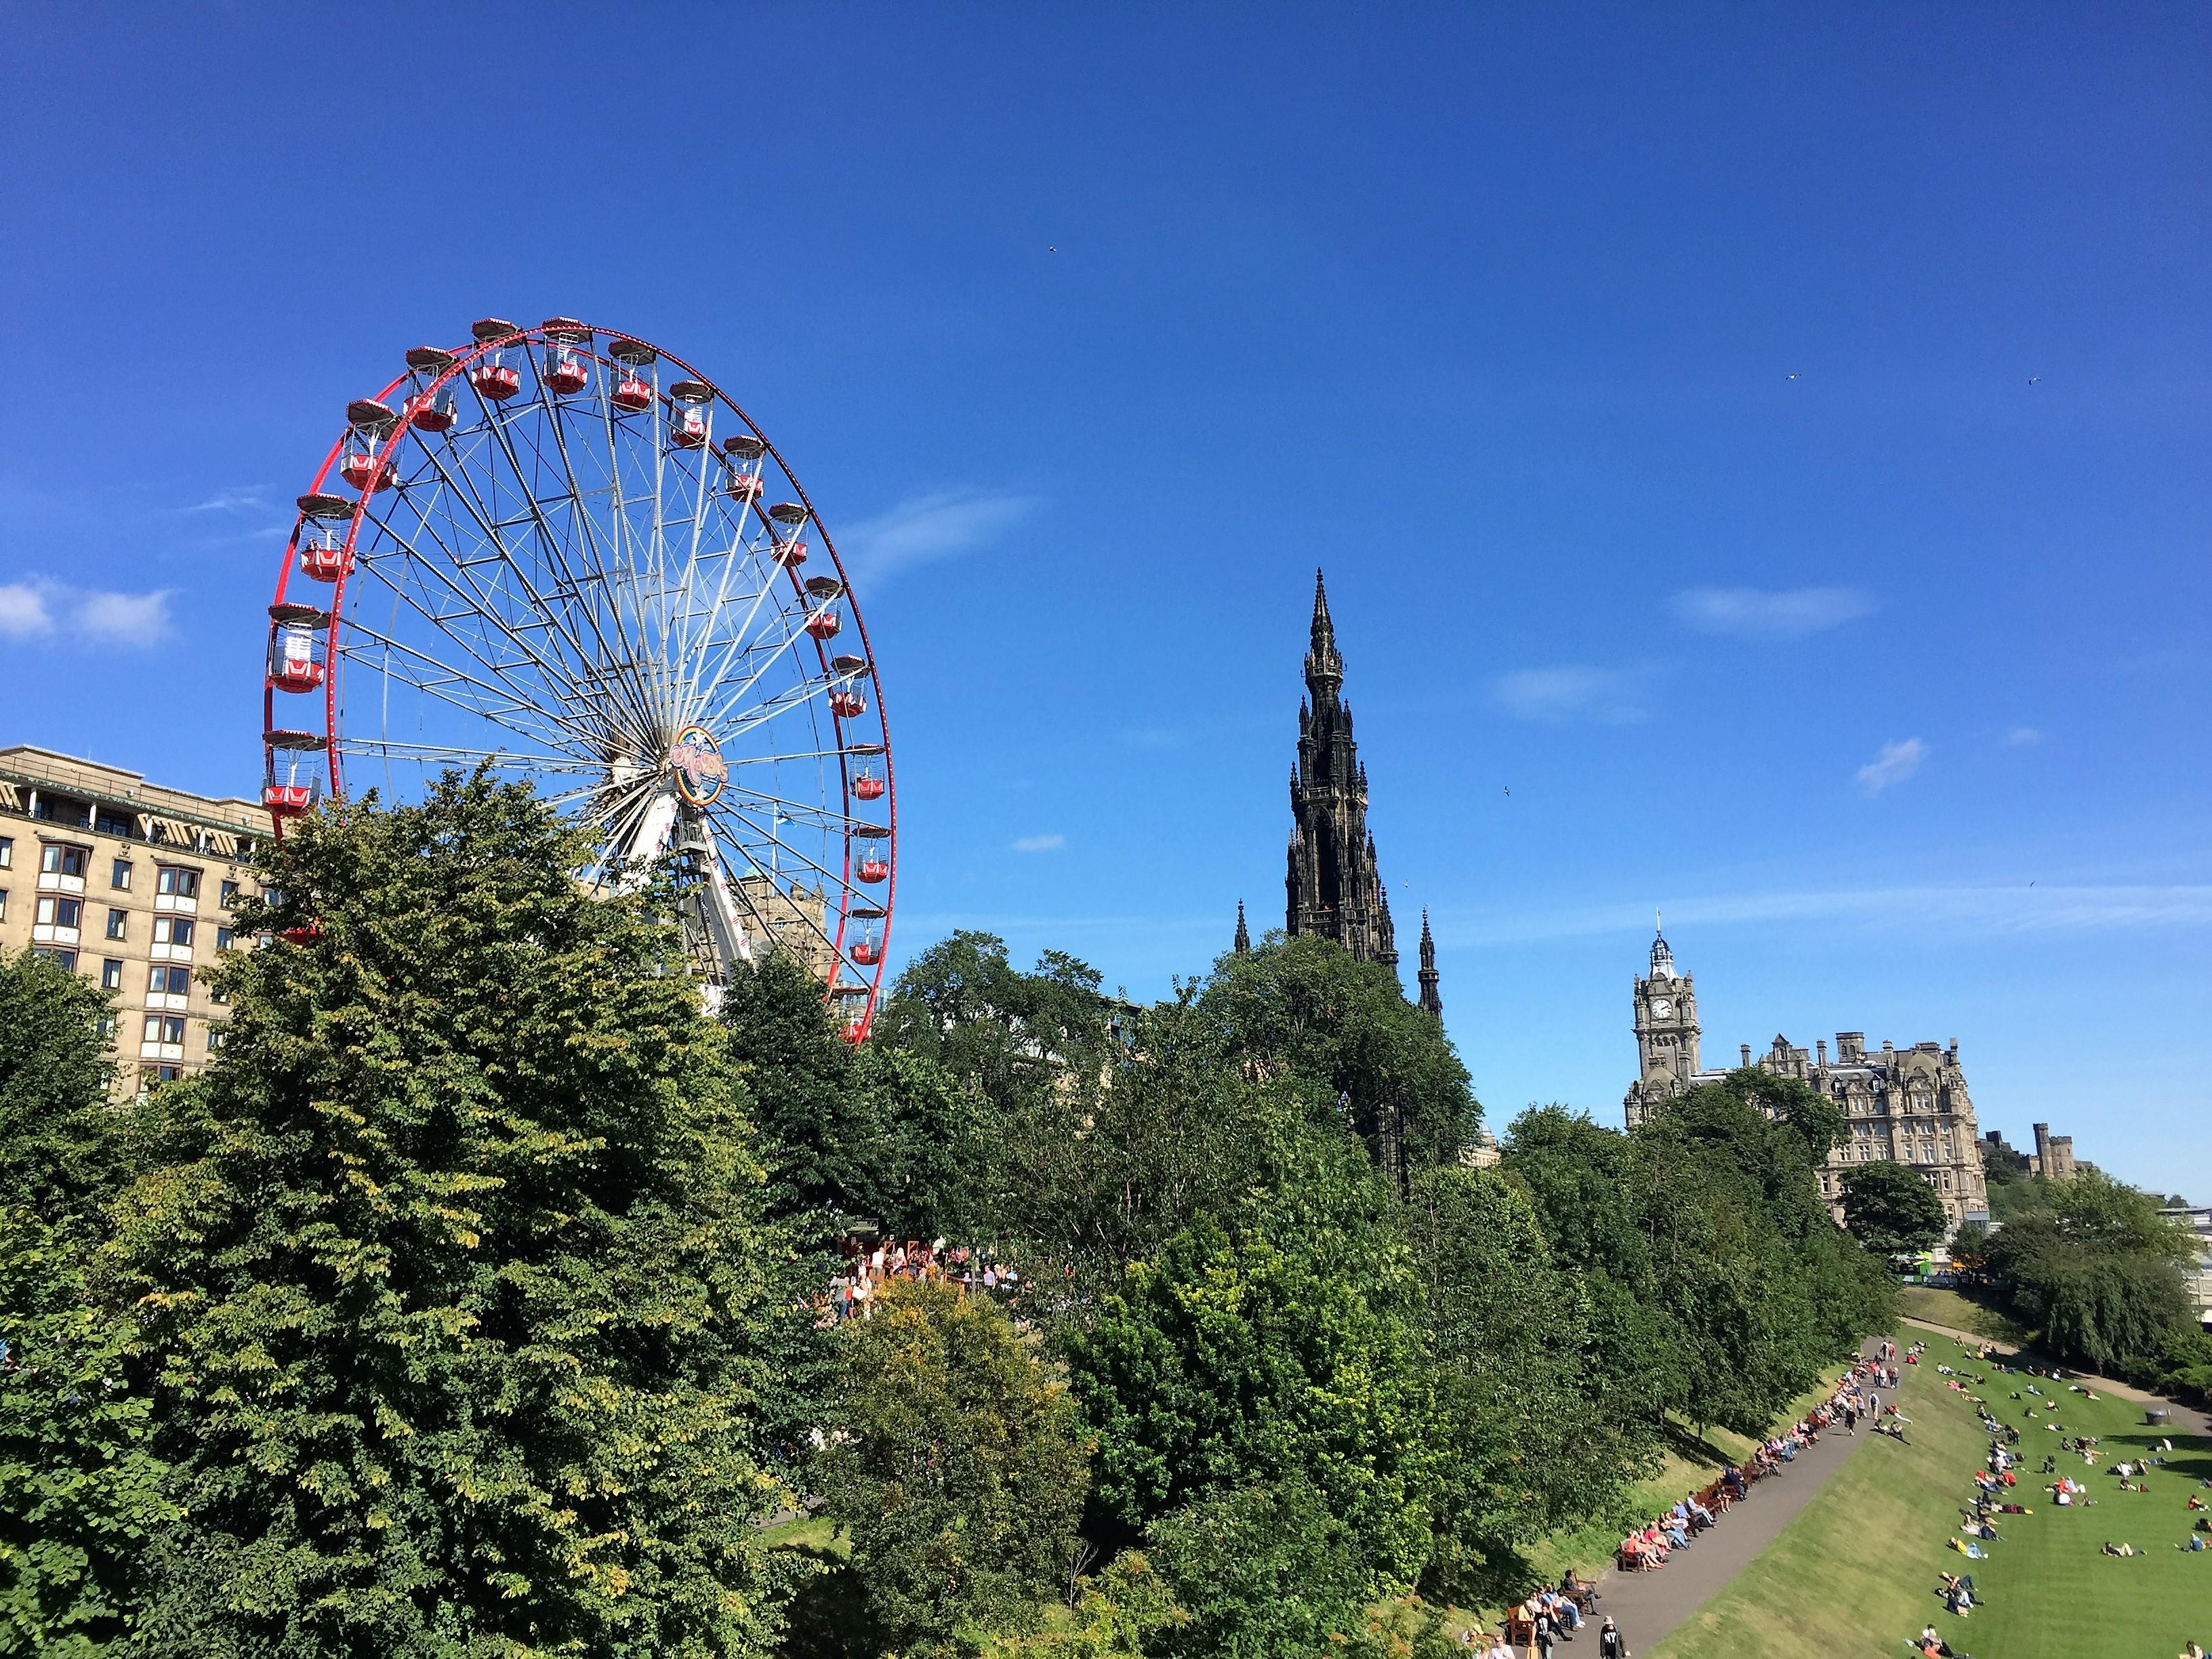 Walking along the riverfront in Edinburgh.